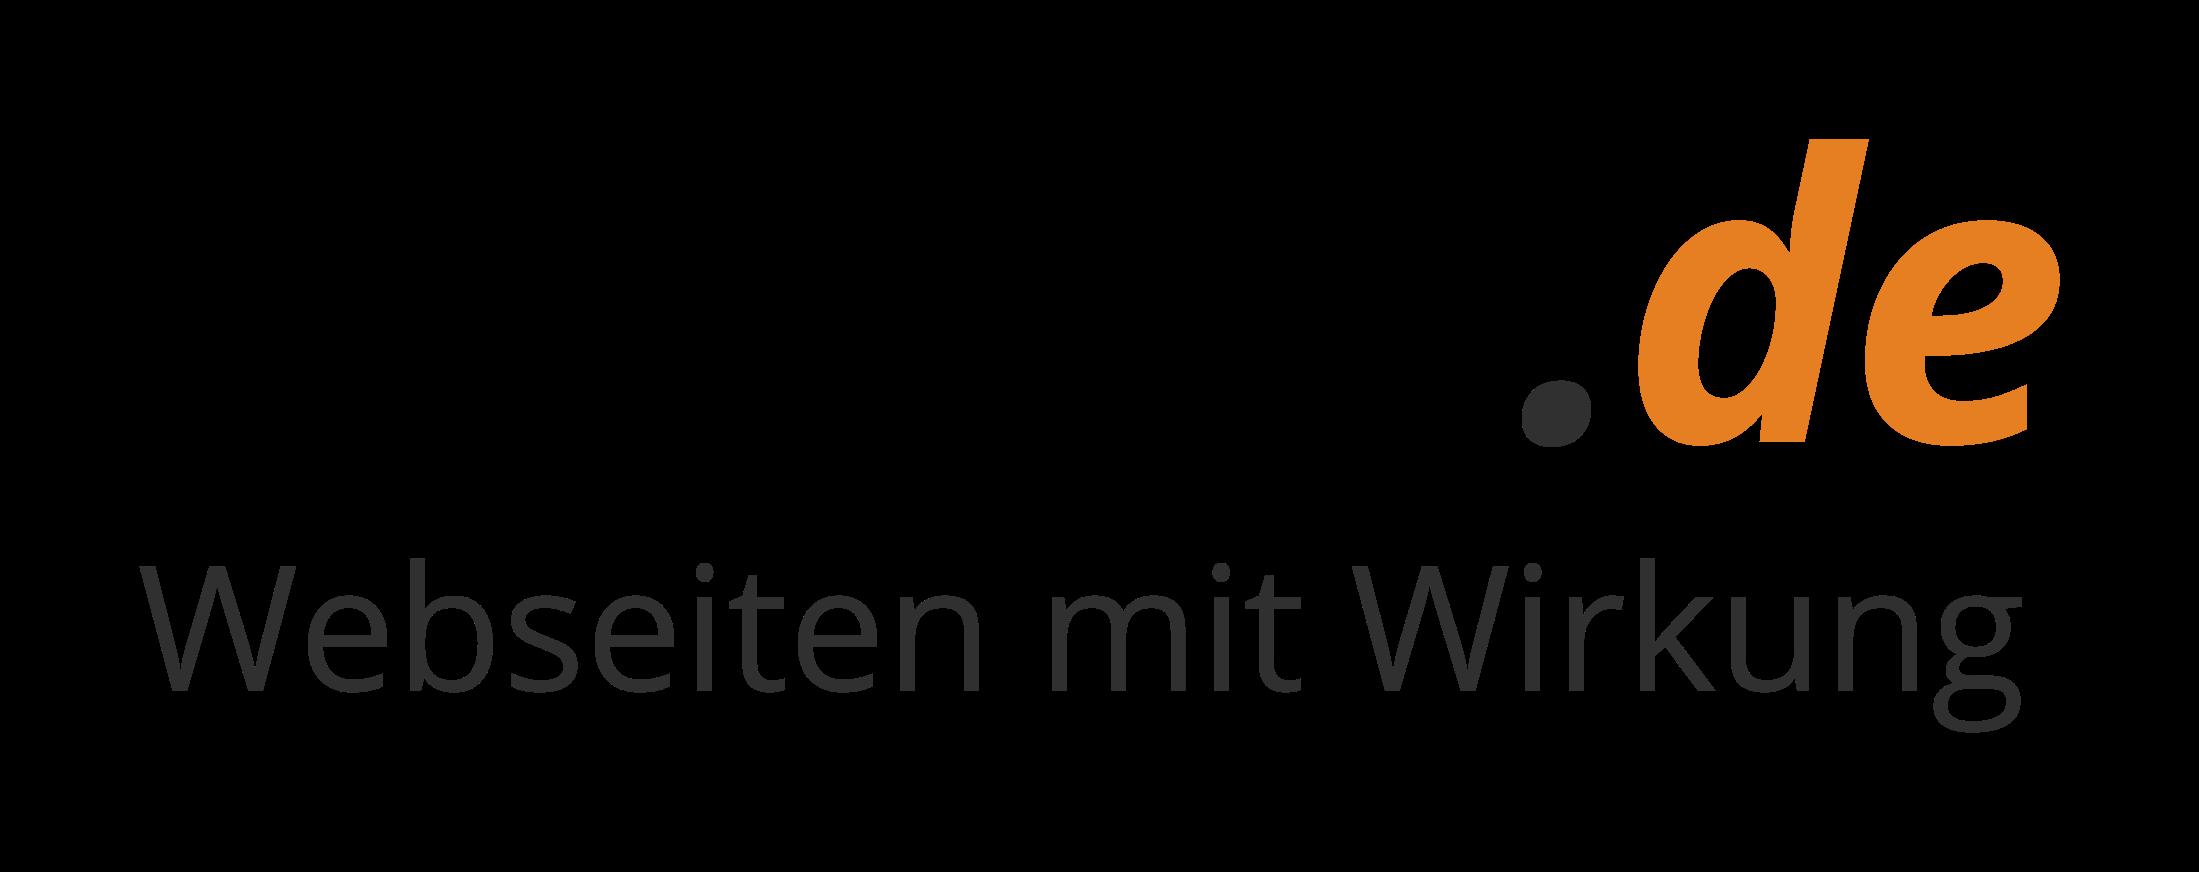 Webagentur WEMWI